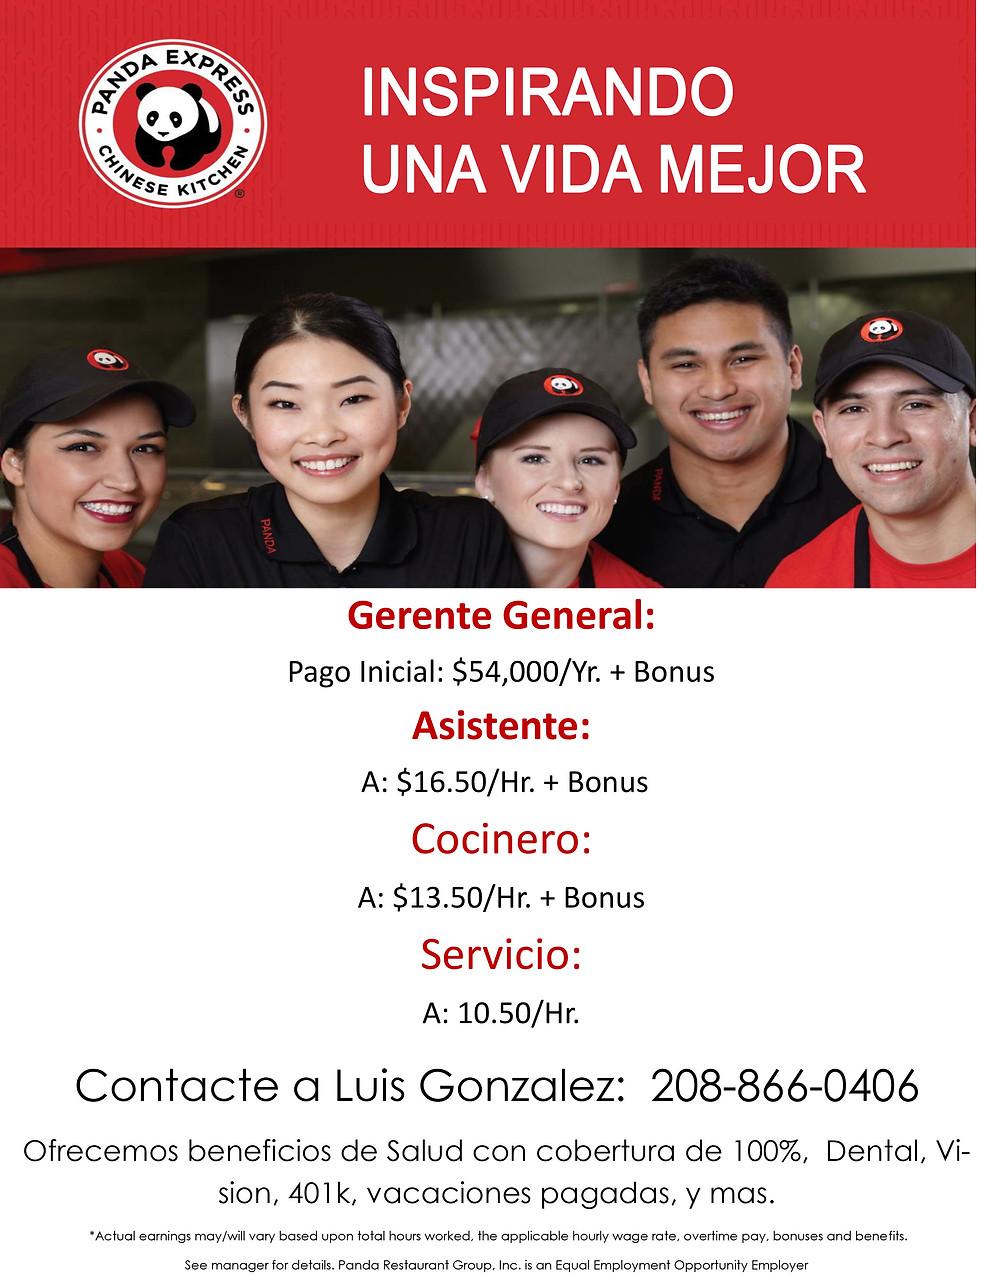 Panda express sigue contratando personal para trabajar. LLama a Luis Gonzalez a 208-866-0406